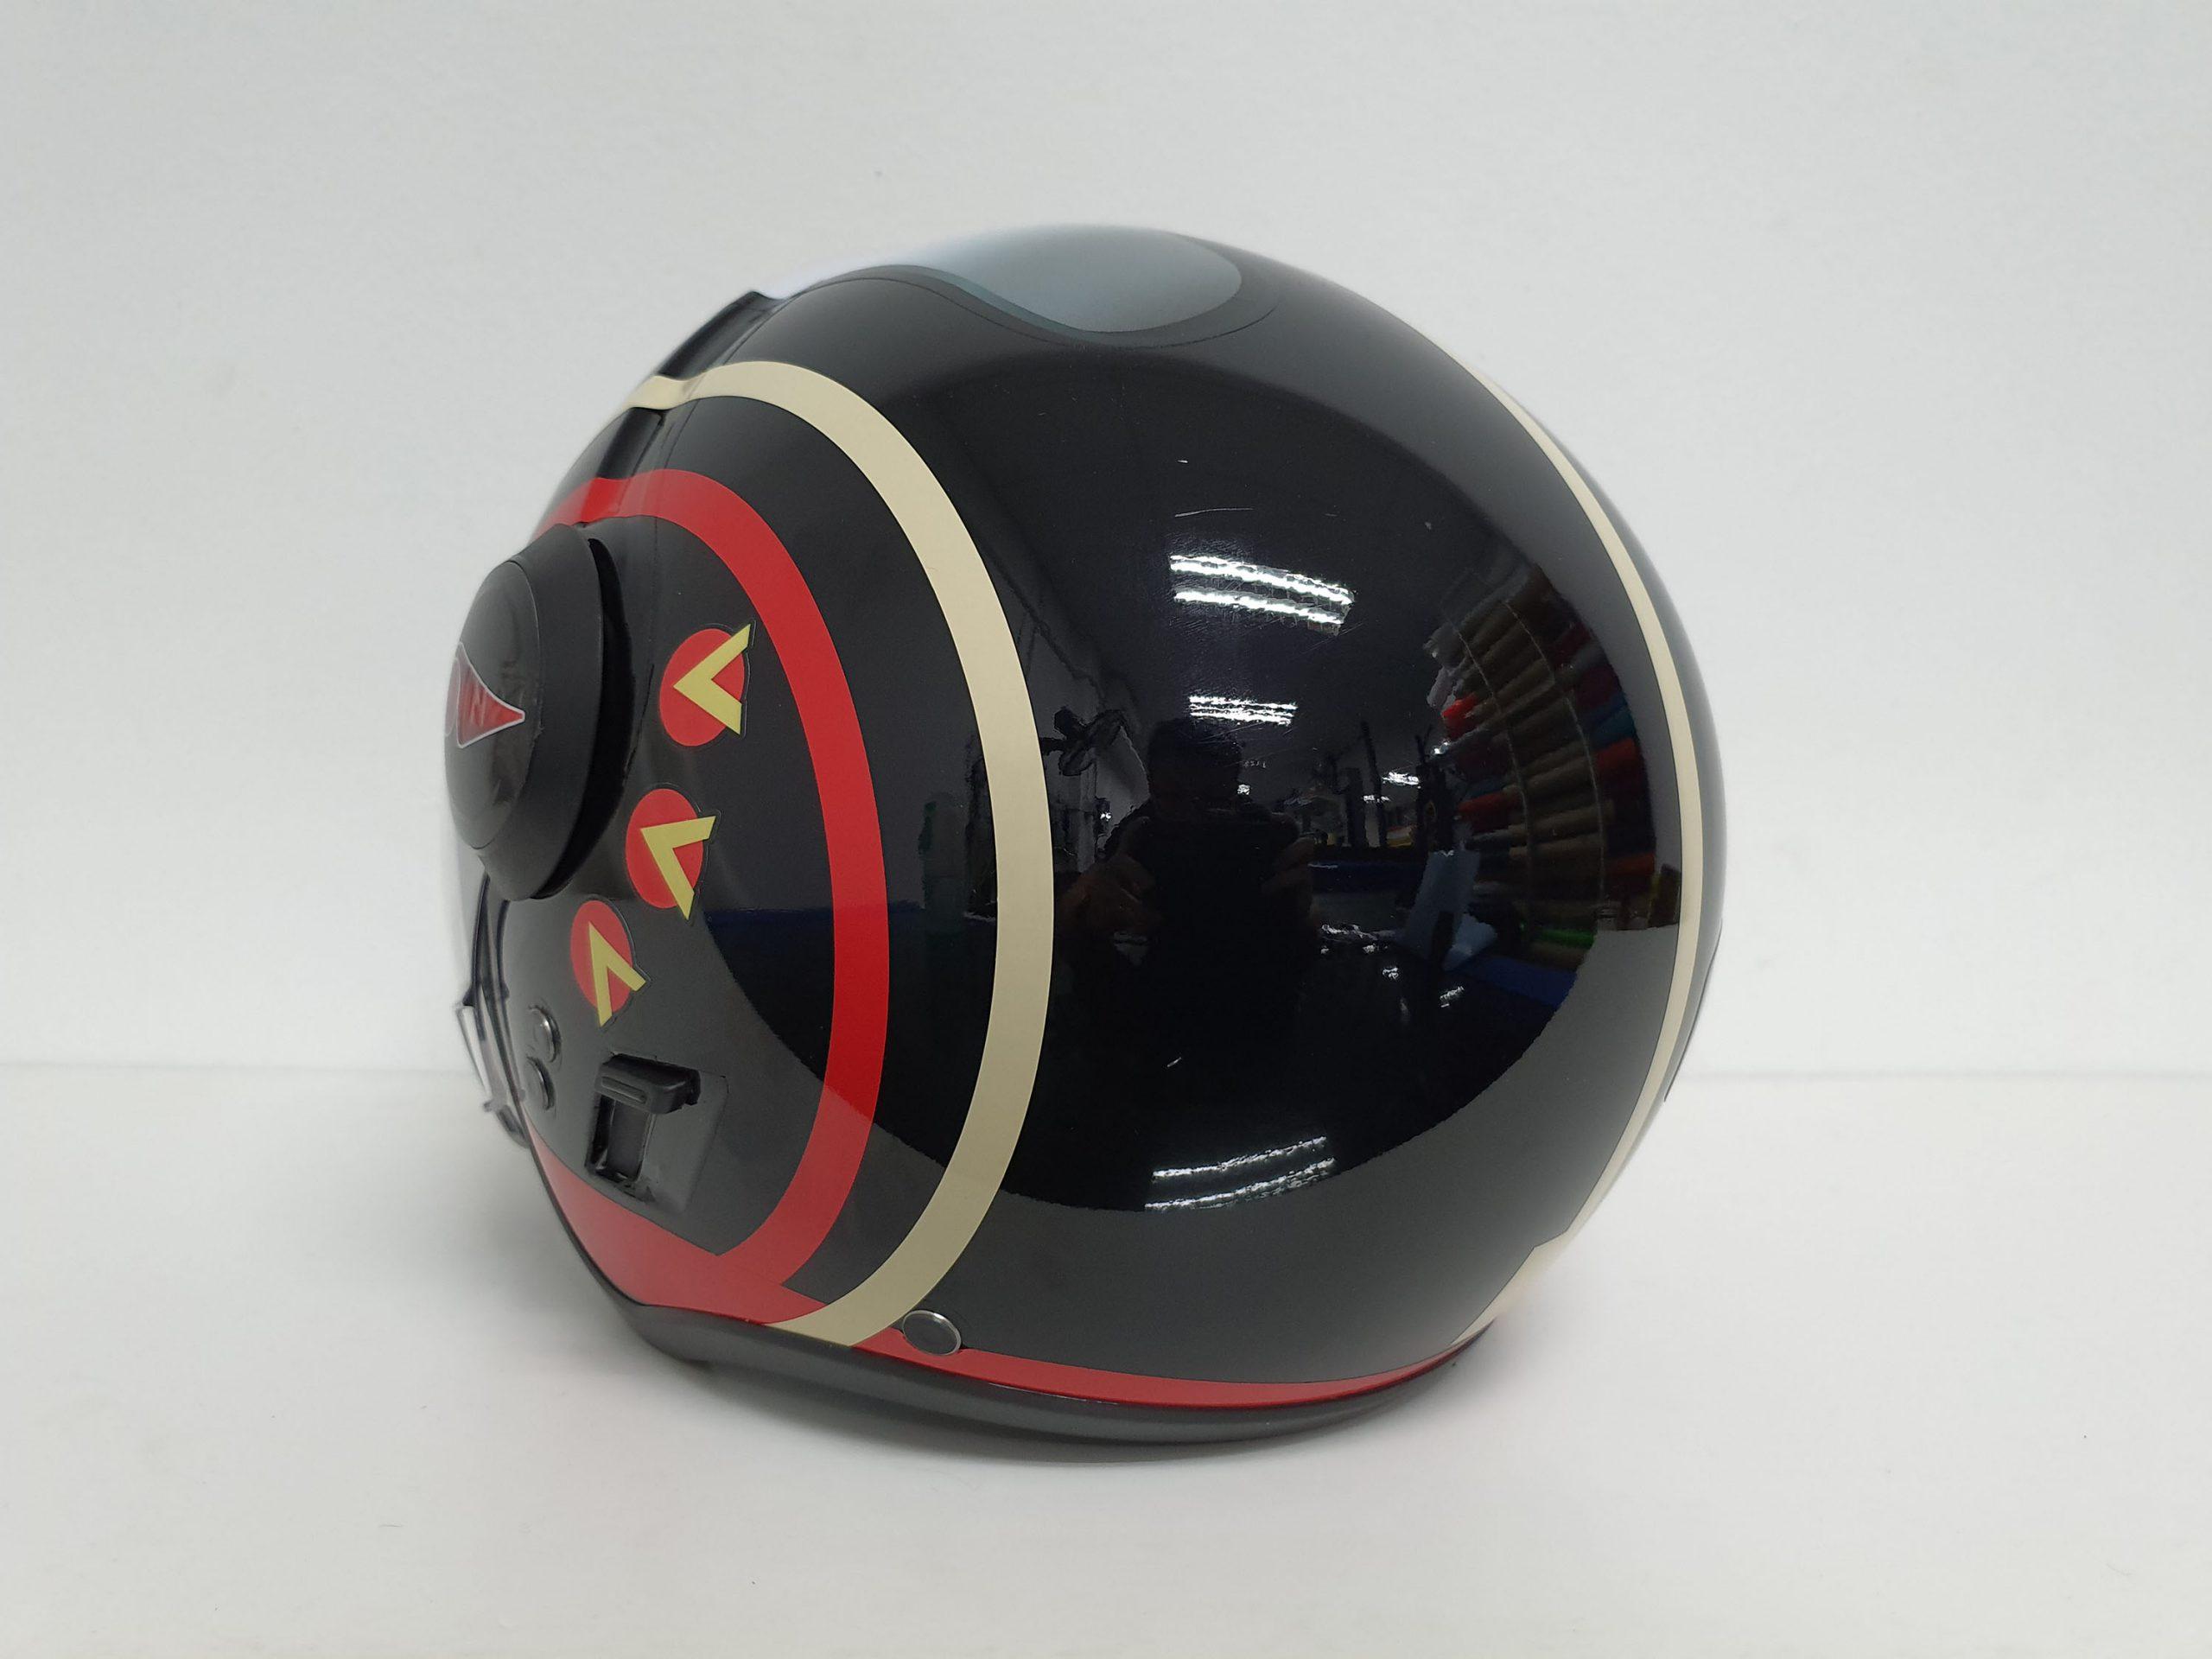 Back View of Starwars X-Wing Fighter Helmet Design